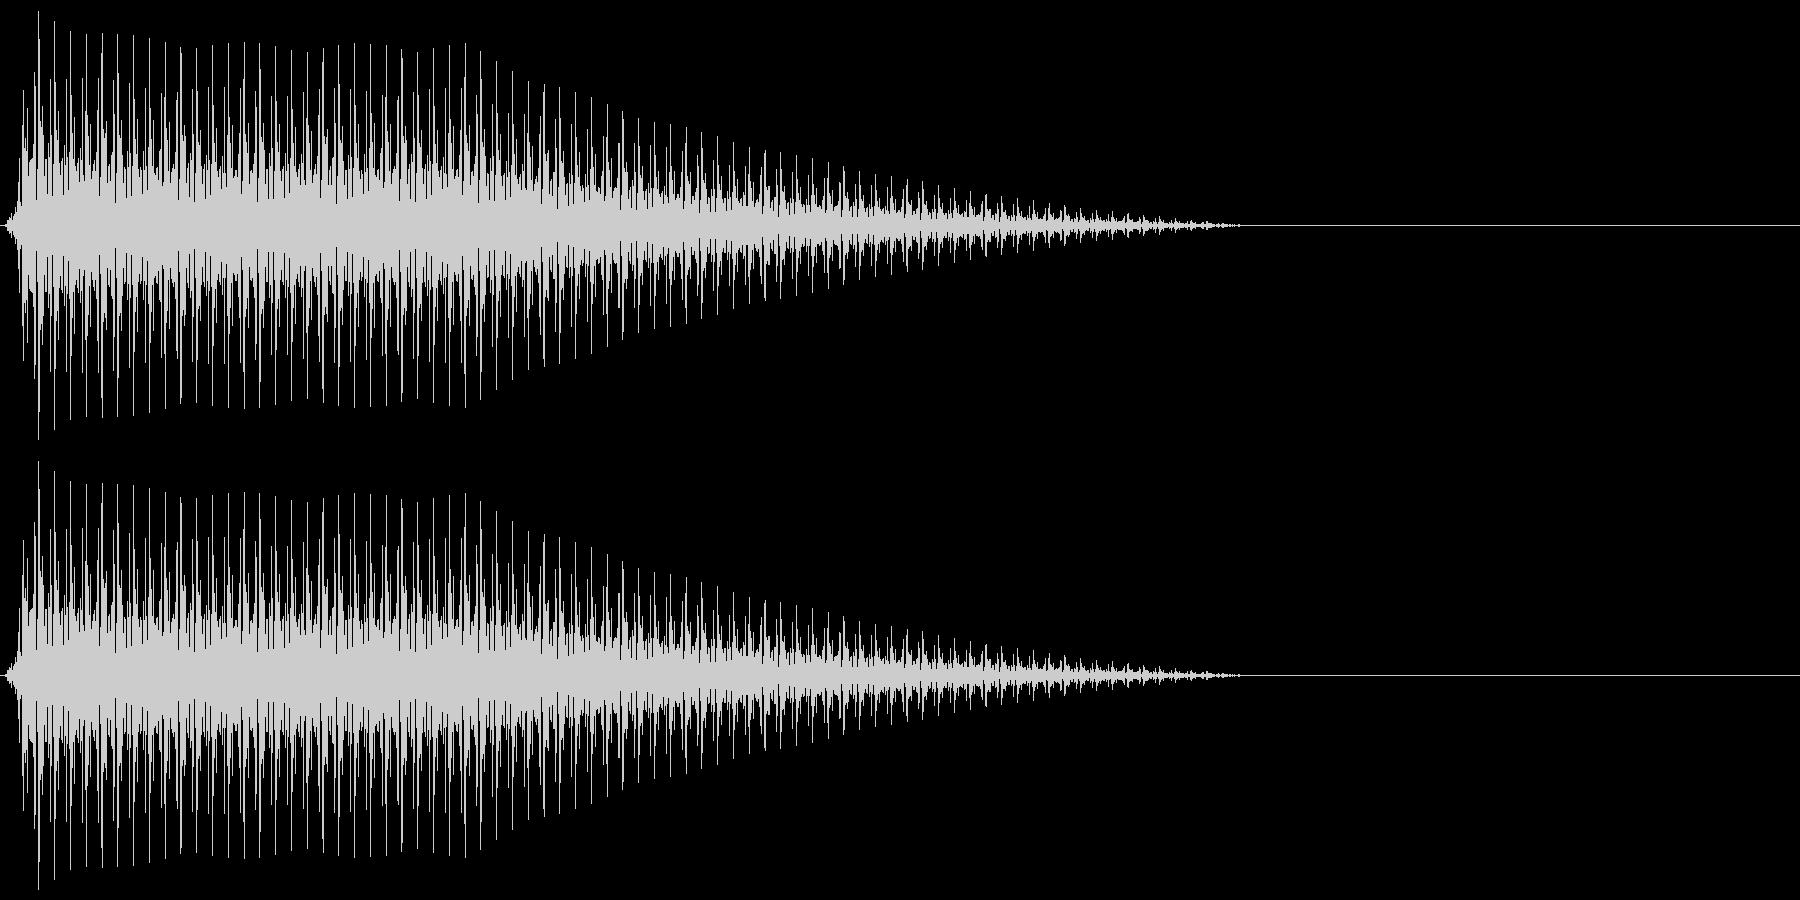 OctaveCom アプリ用タッチ音6の未再生の波形